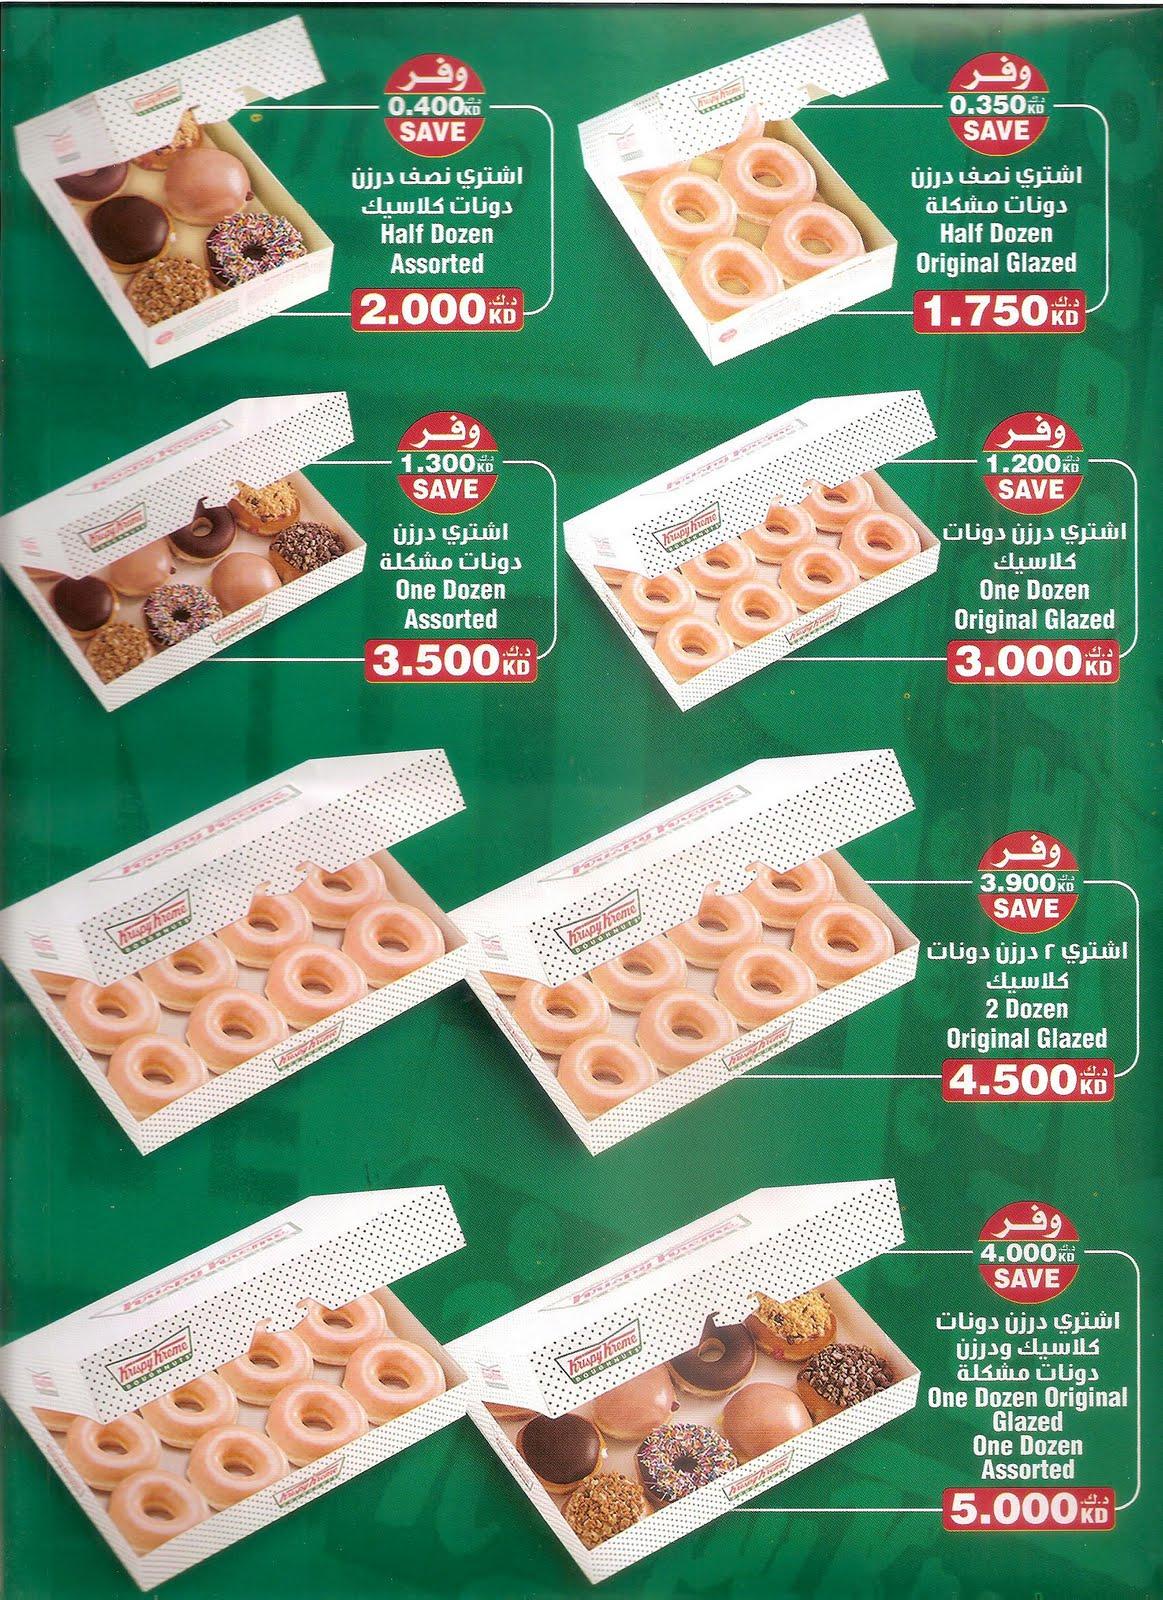 Krispy Kreme Wedding Cake Price